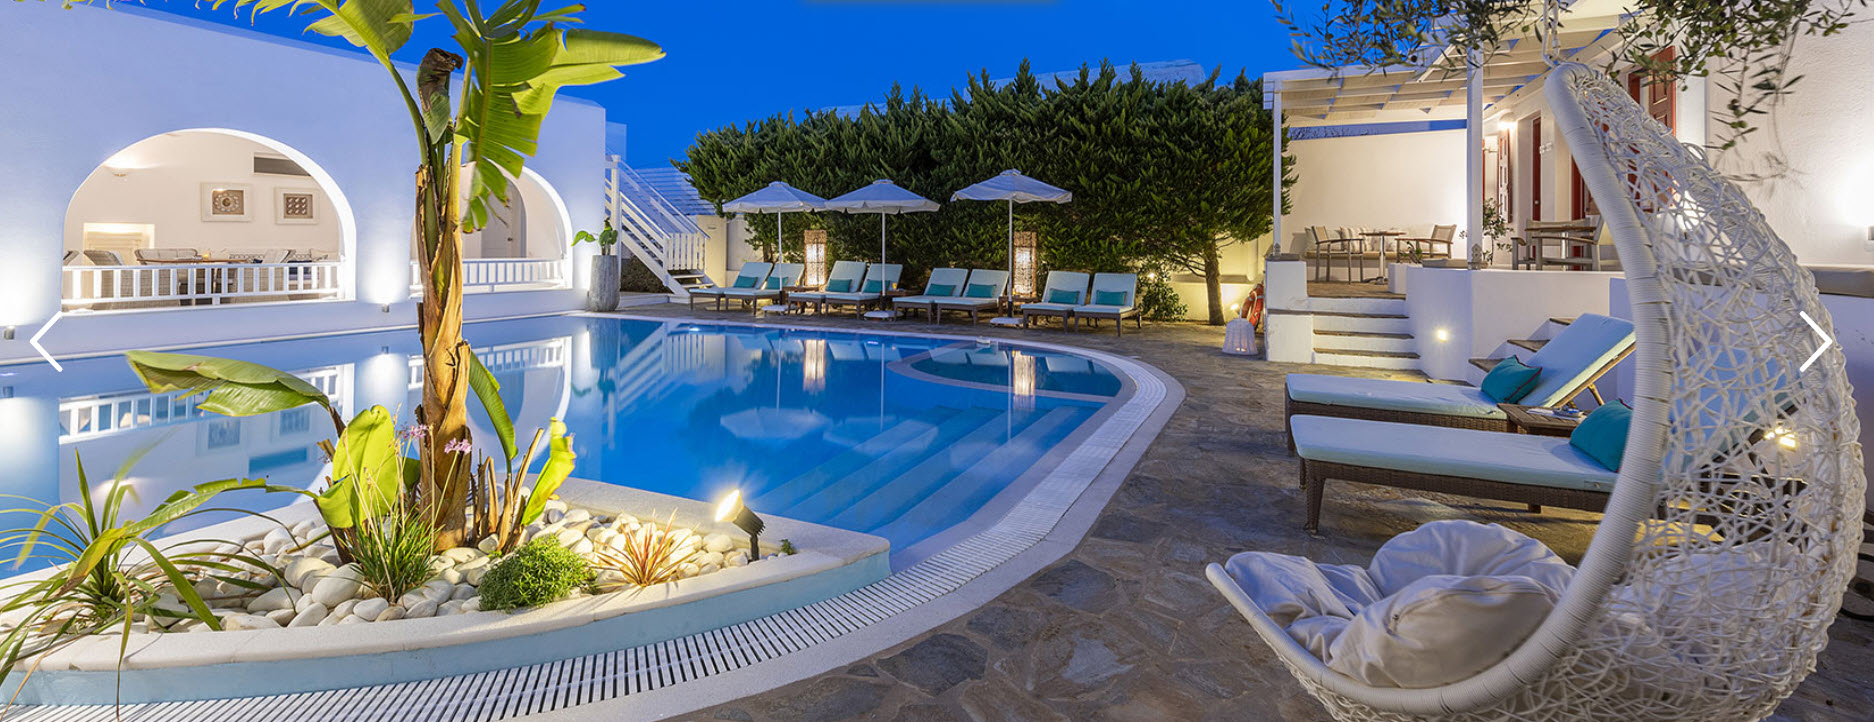 Stelia Mare Boutique Hotel - Πάρος ✦ -5% ✦ 2 Ημέρες (1 Διανυκτέρευση) ✦ 2 άτομα ✦ Πρωινό ✦ 01/09/2021 έως 30/09/2021 ✦ Μπροστά στην παραλία!